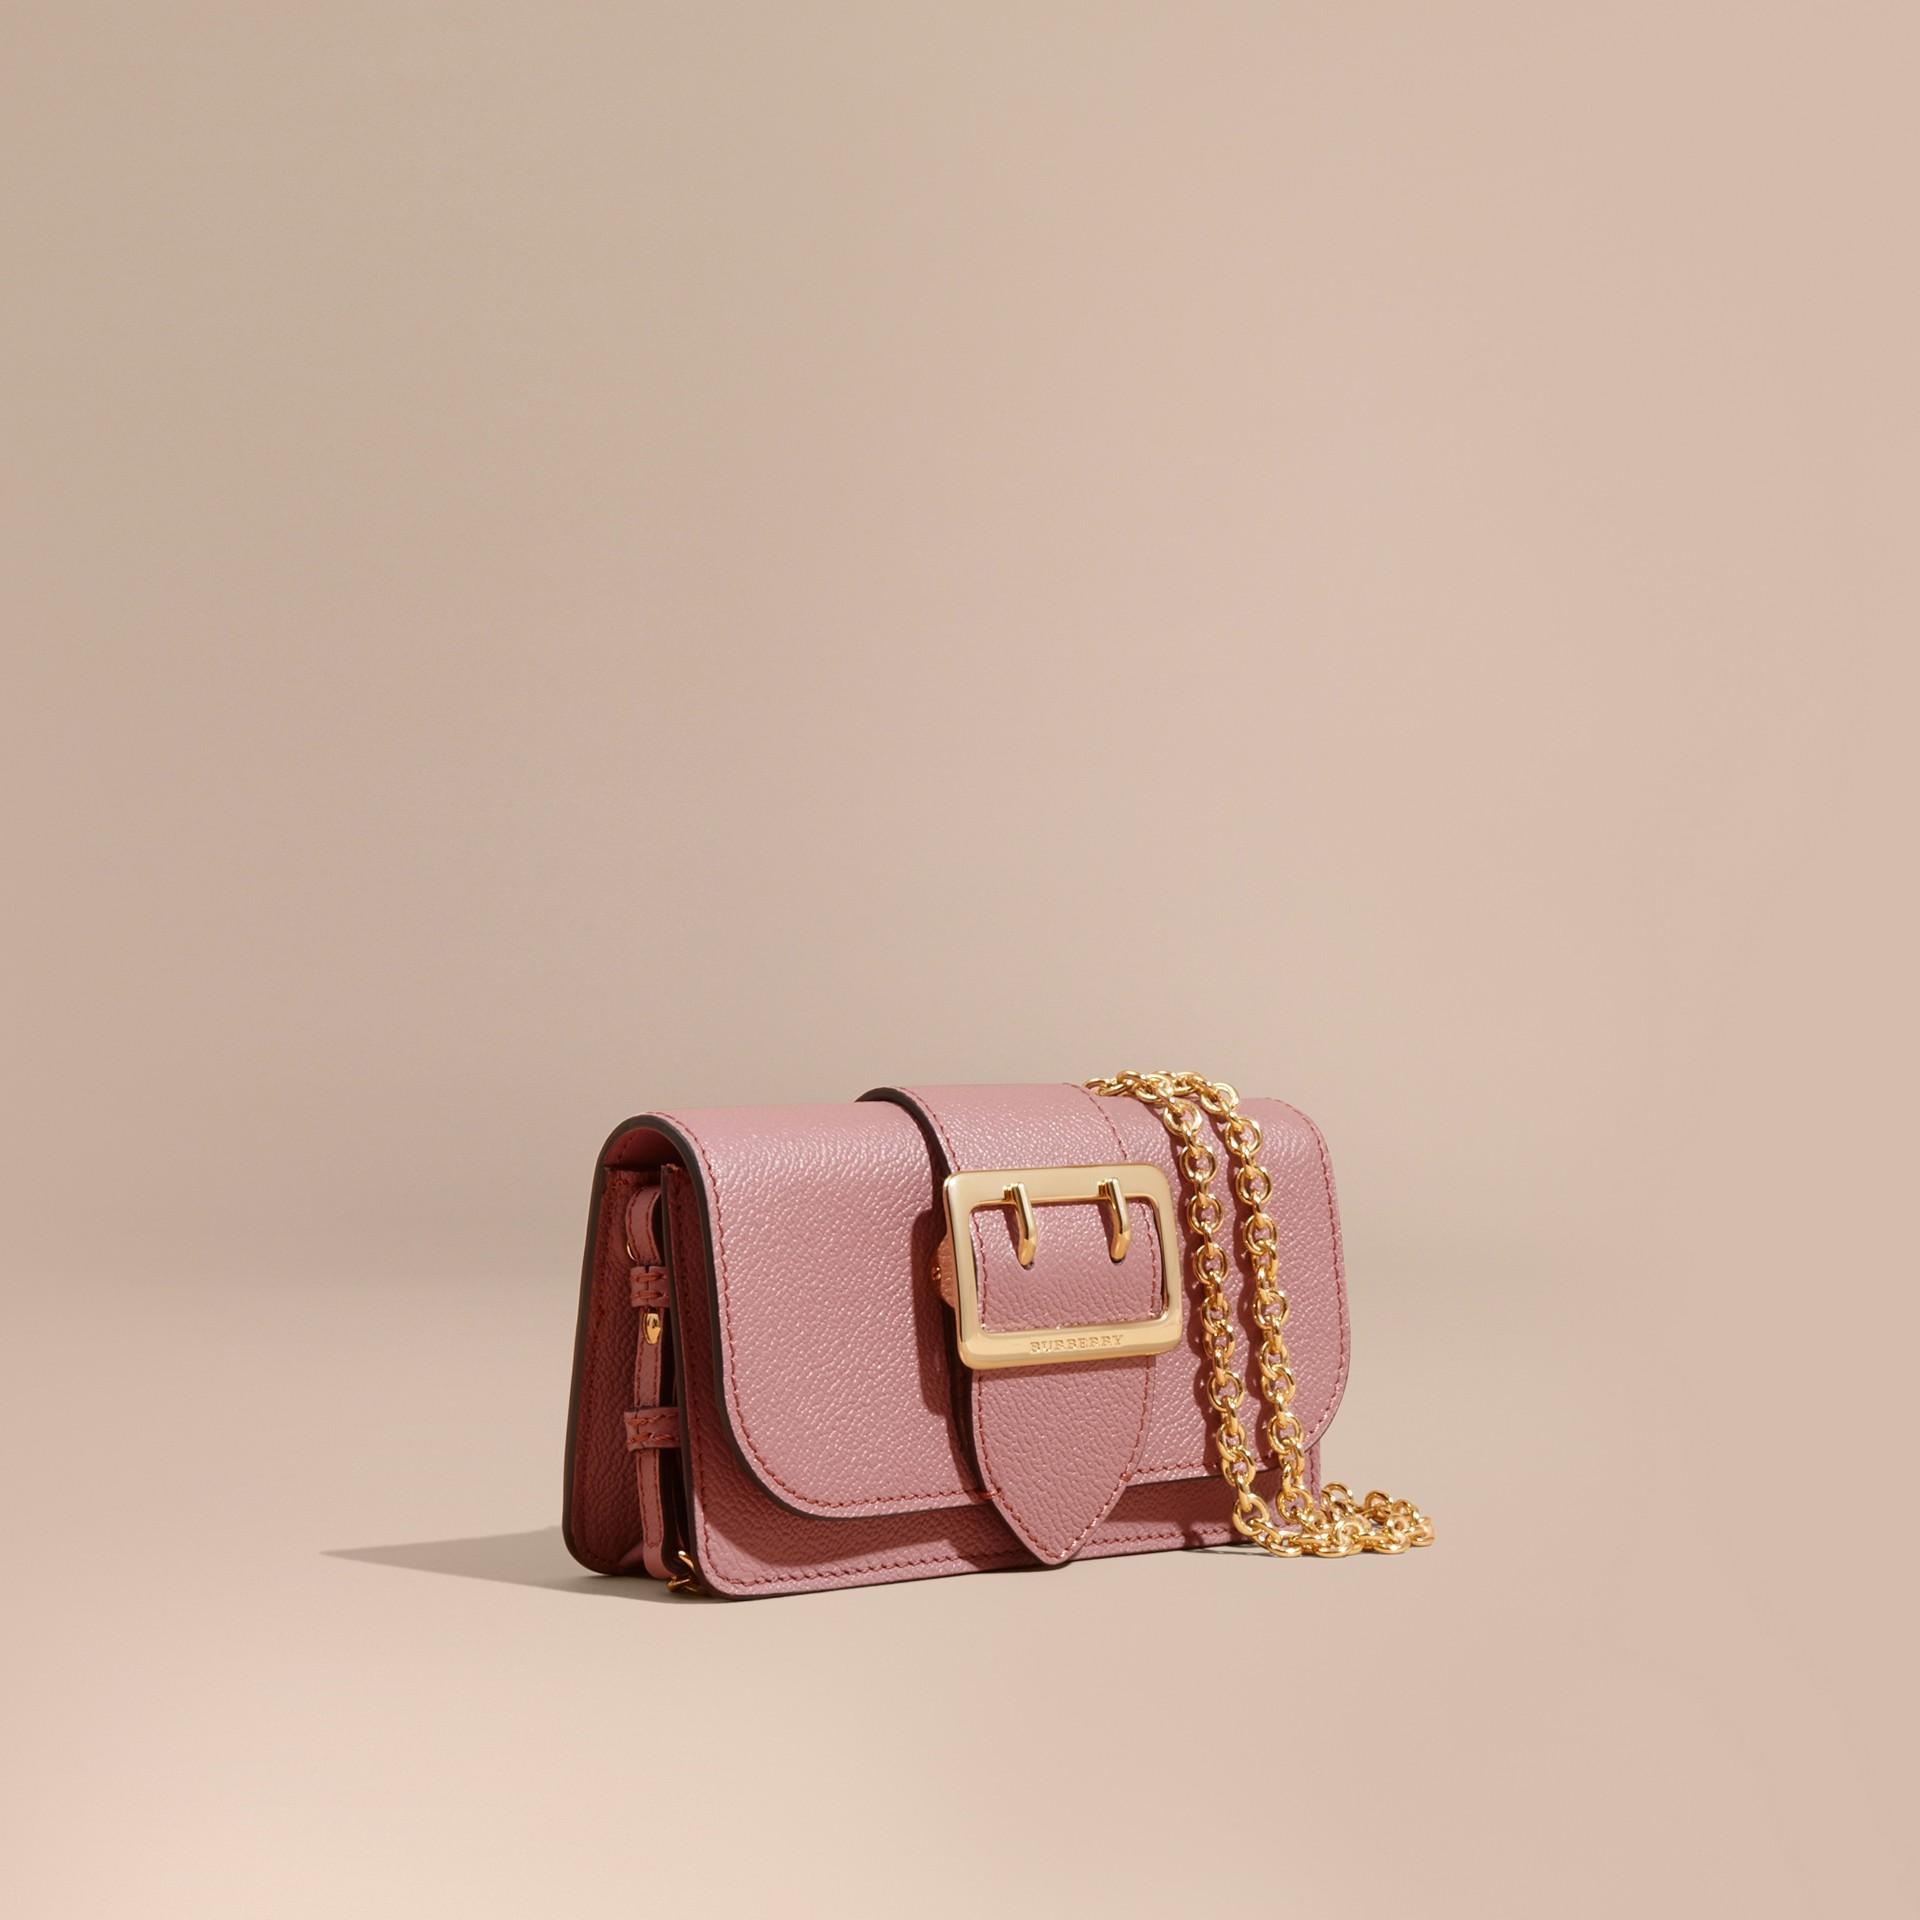 Rosa terroso Bolsa Buckle mini de couro granulado Rosa Terroso - galeria de imagens 1